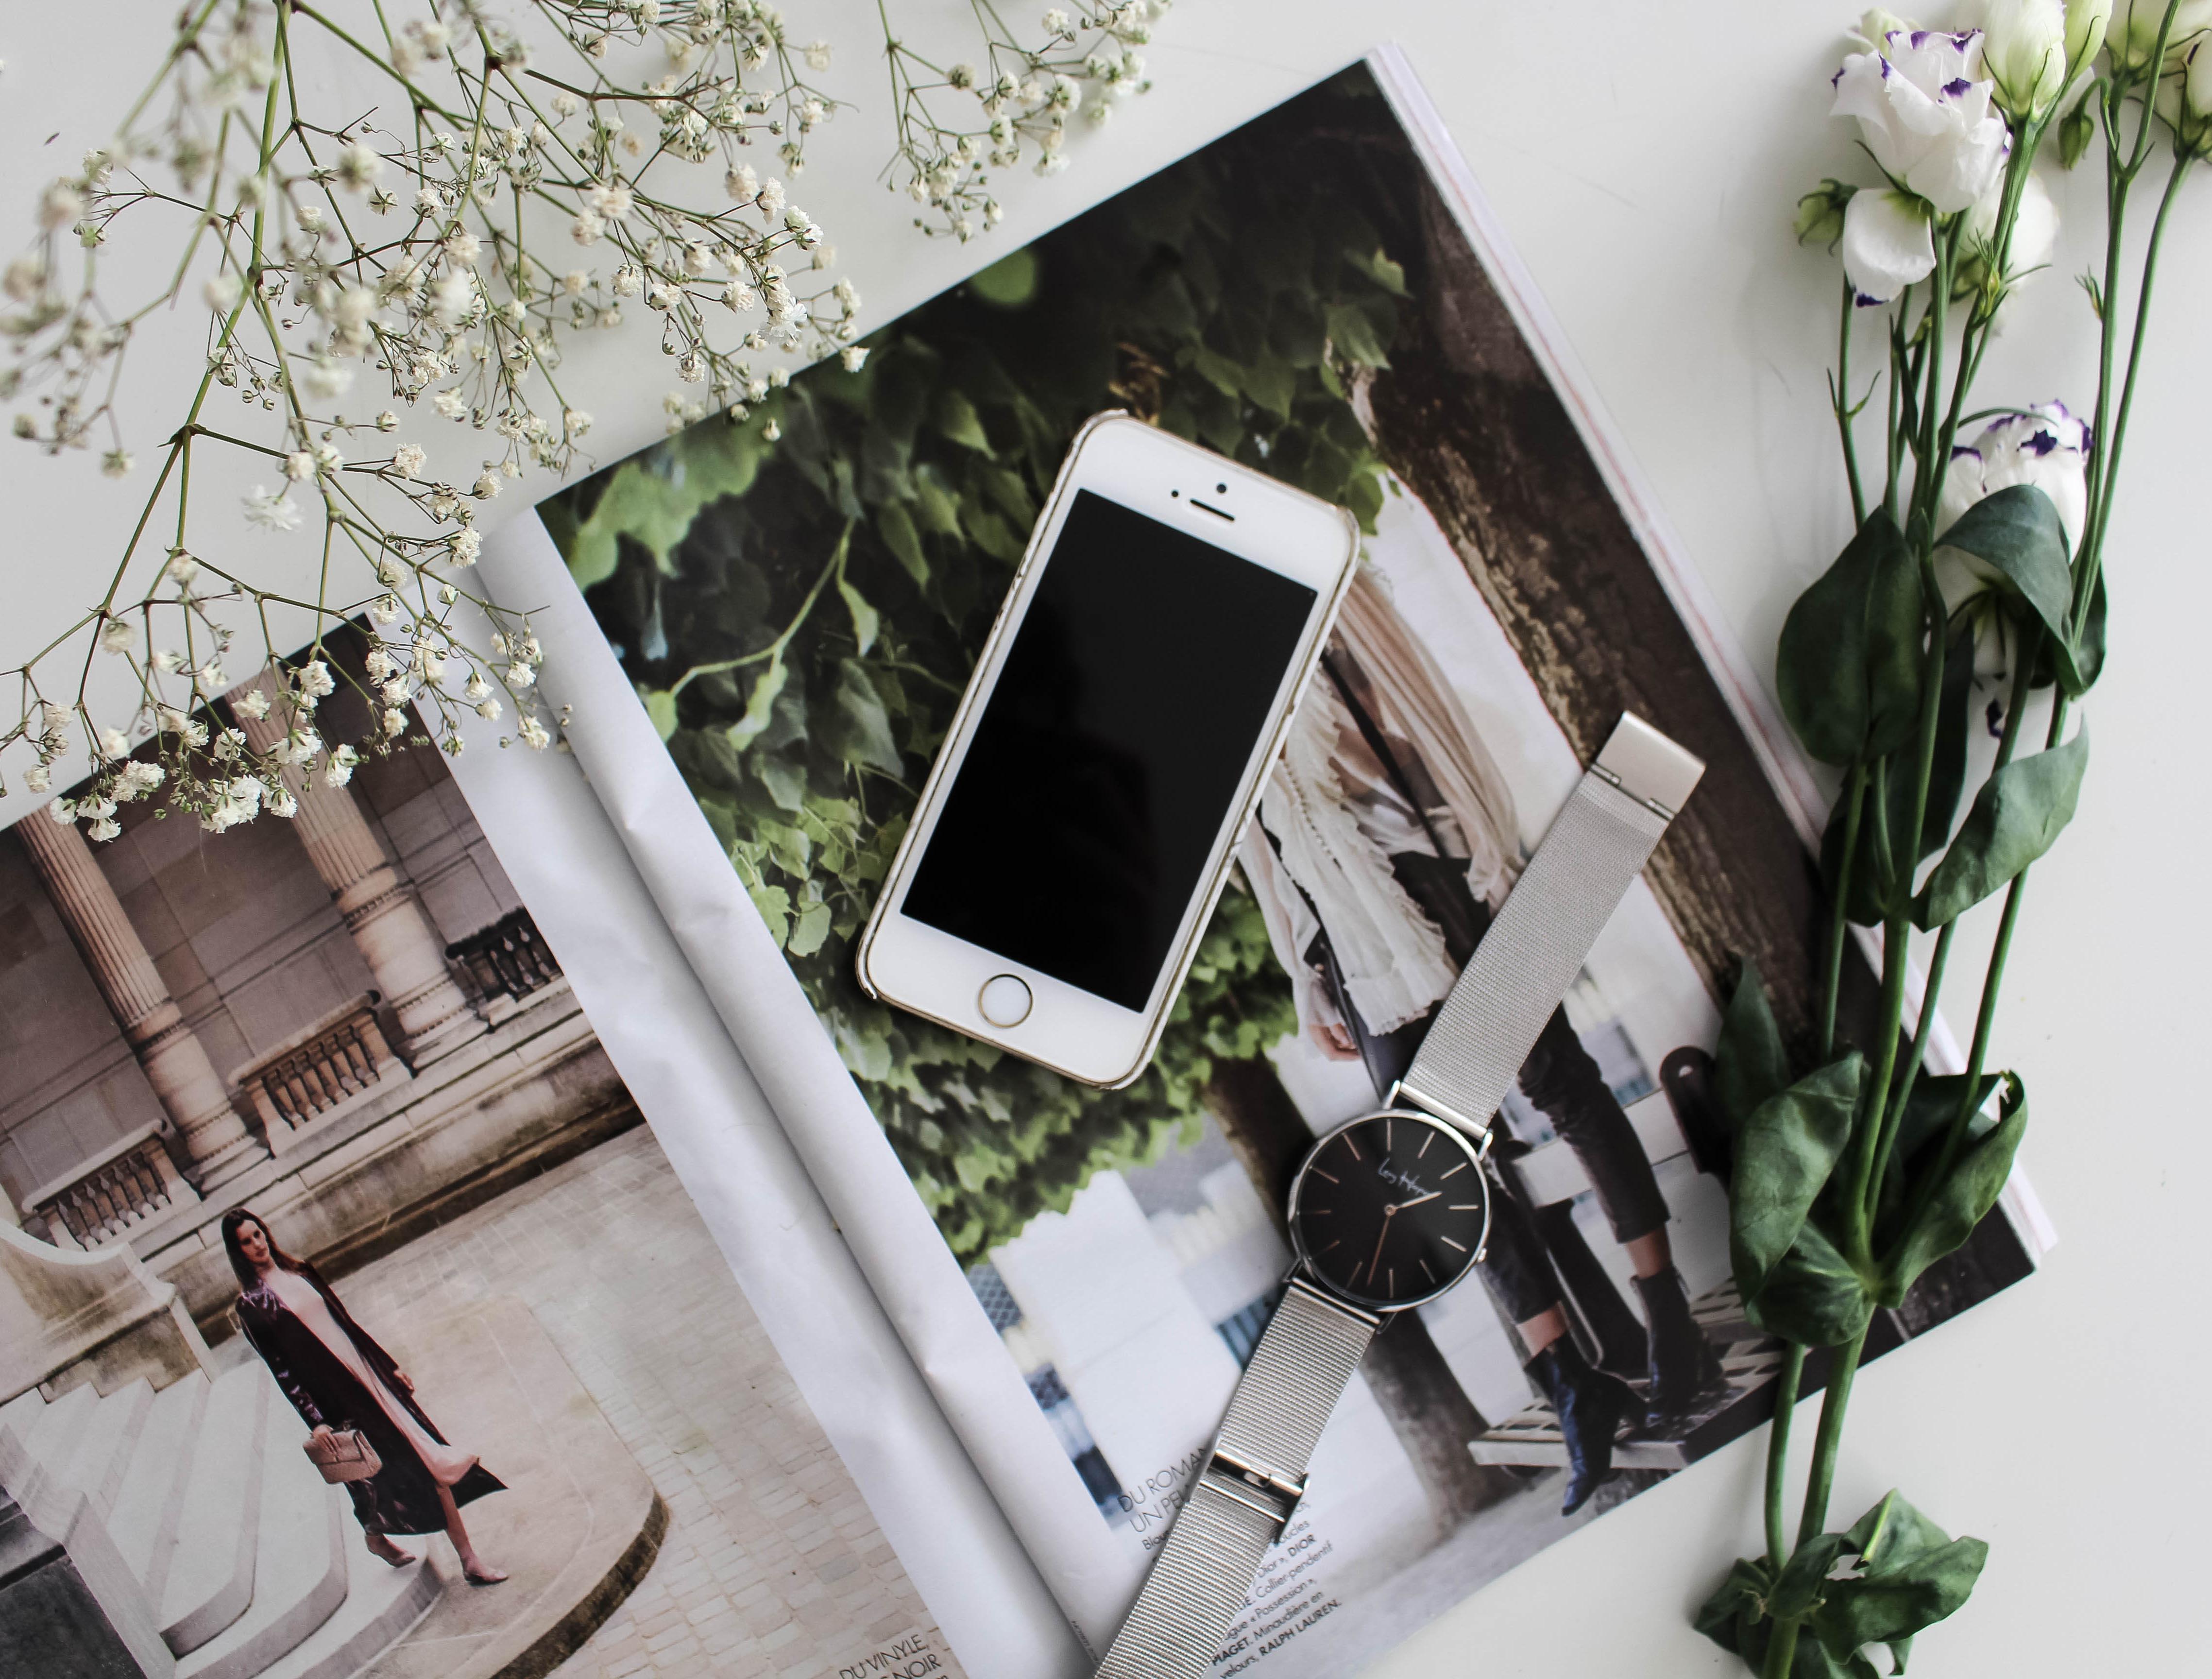 blog-conseils-instagram-linstantflo-13-sur-14